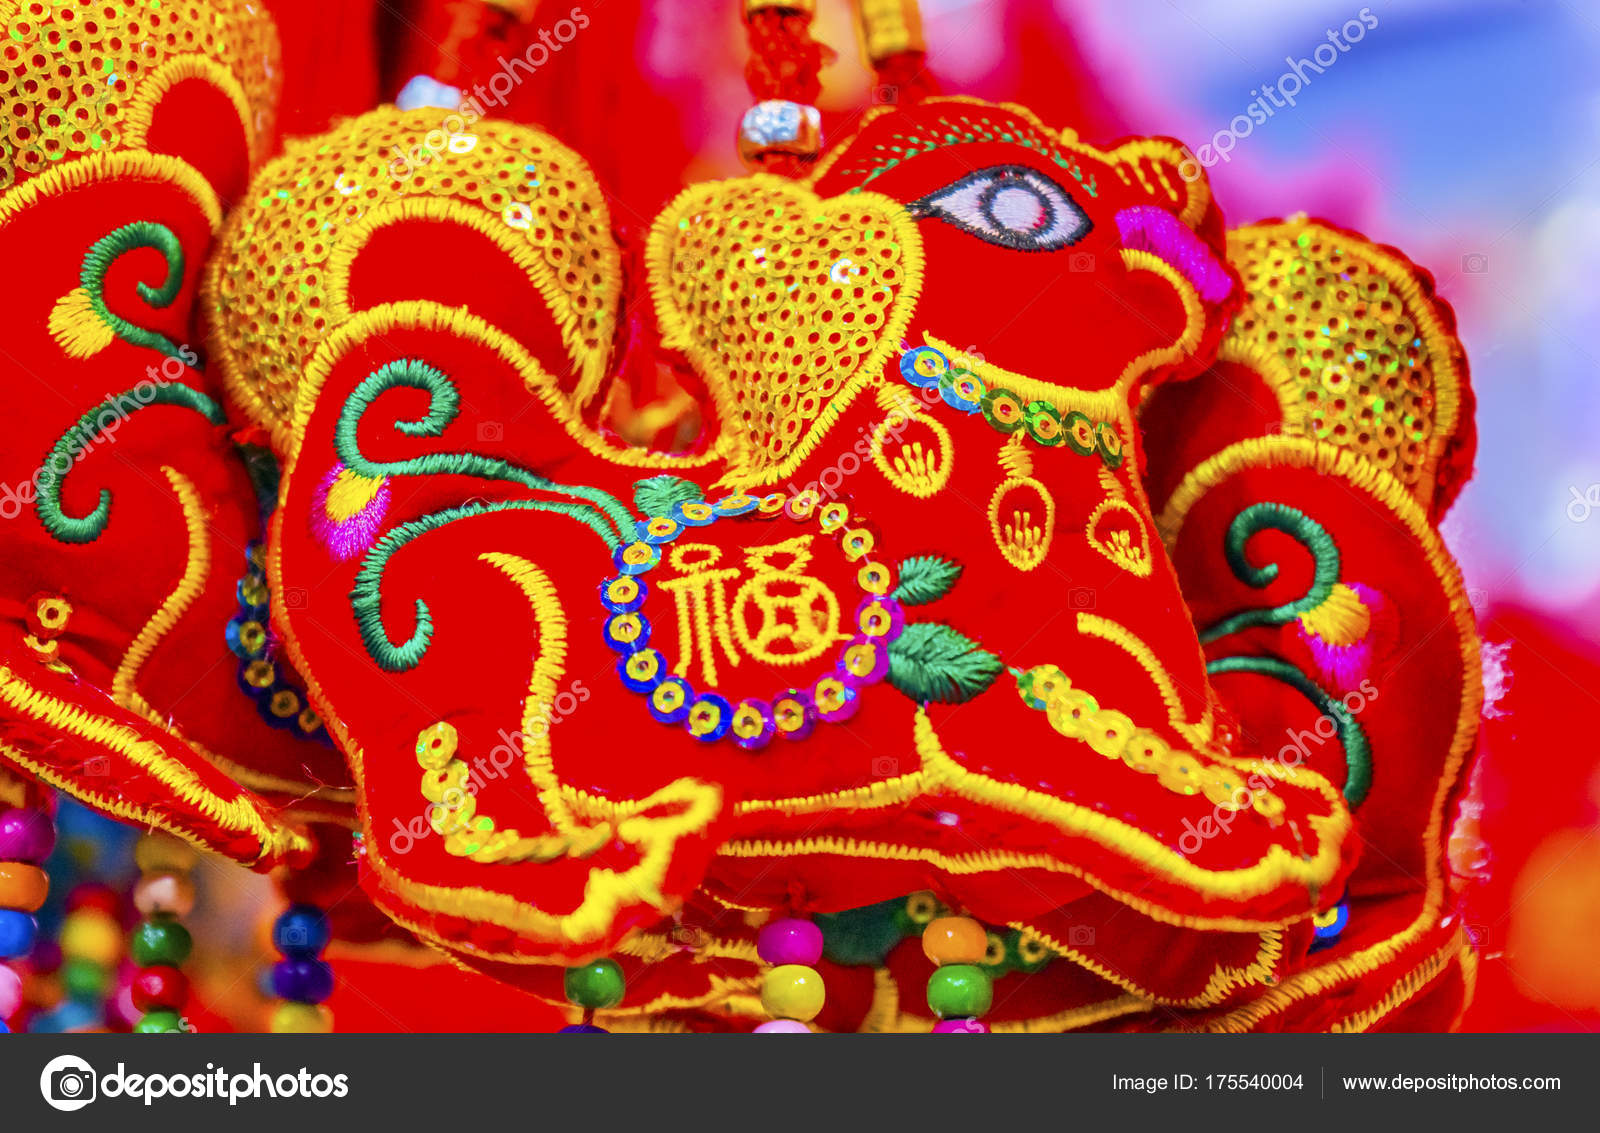 Roten alten Hunden Chinese Lunar New Year Dekorationen Beijing Kinn ...